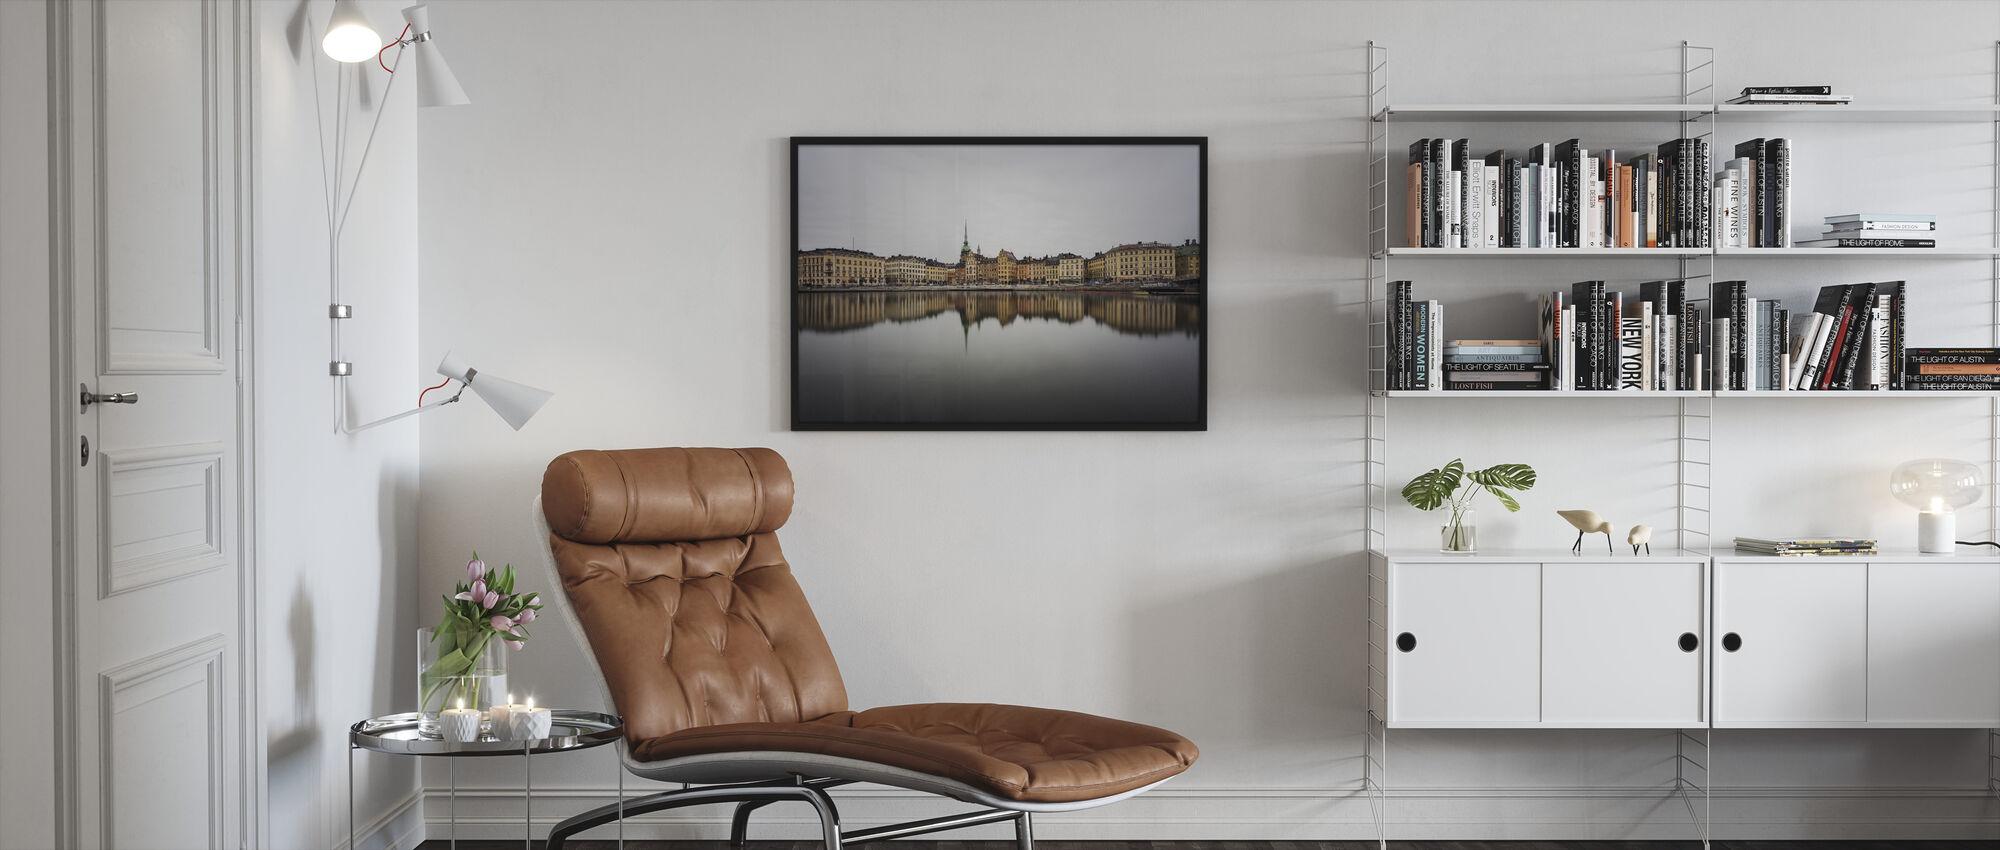 Old Town - Framed print - Living Room